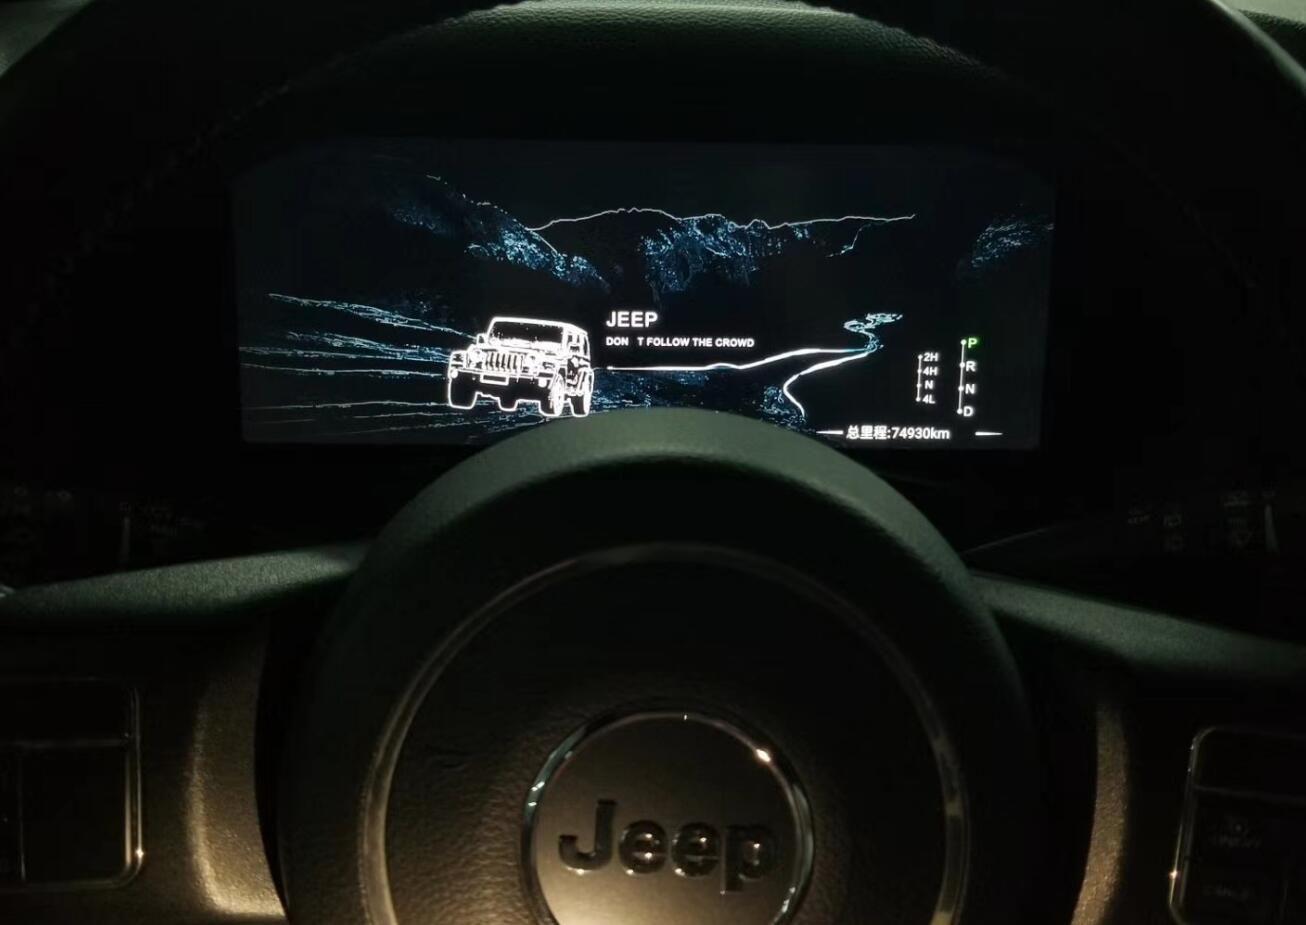 Jeep Wrangler 2010-2017 LCD Digital Dashboard